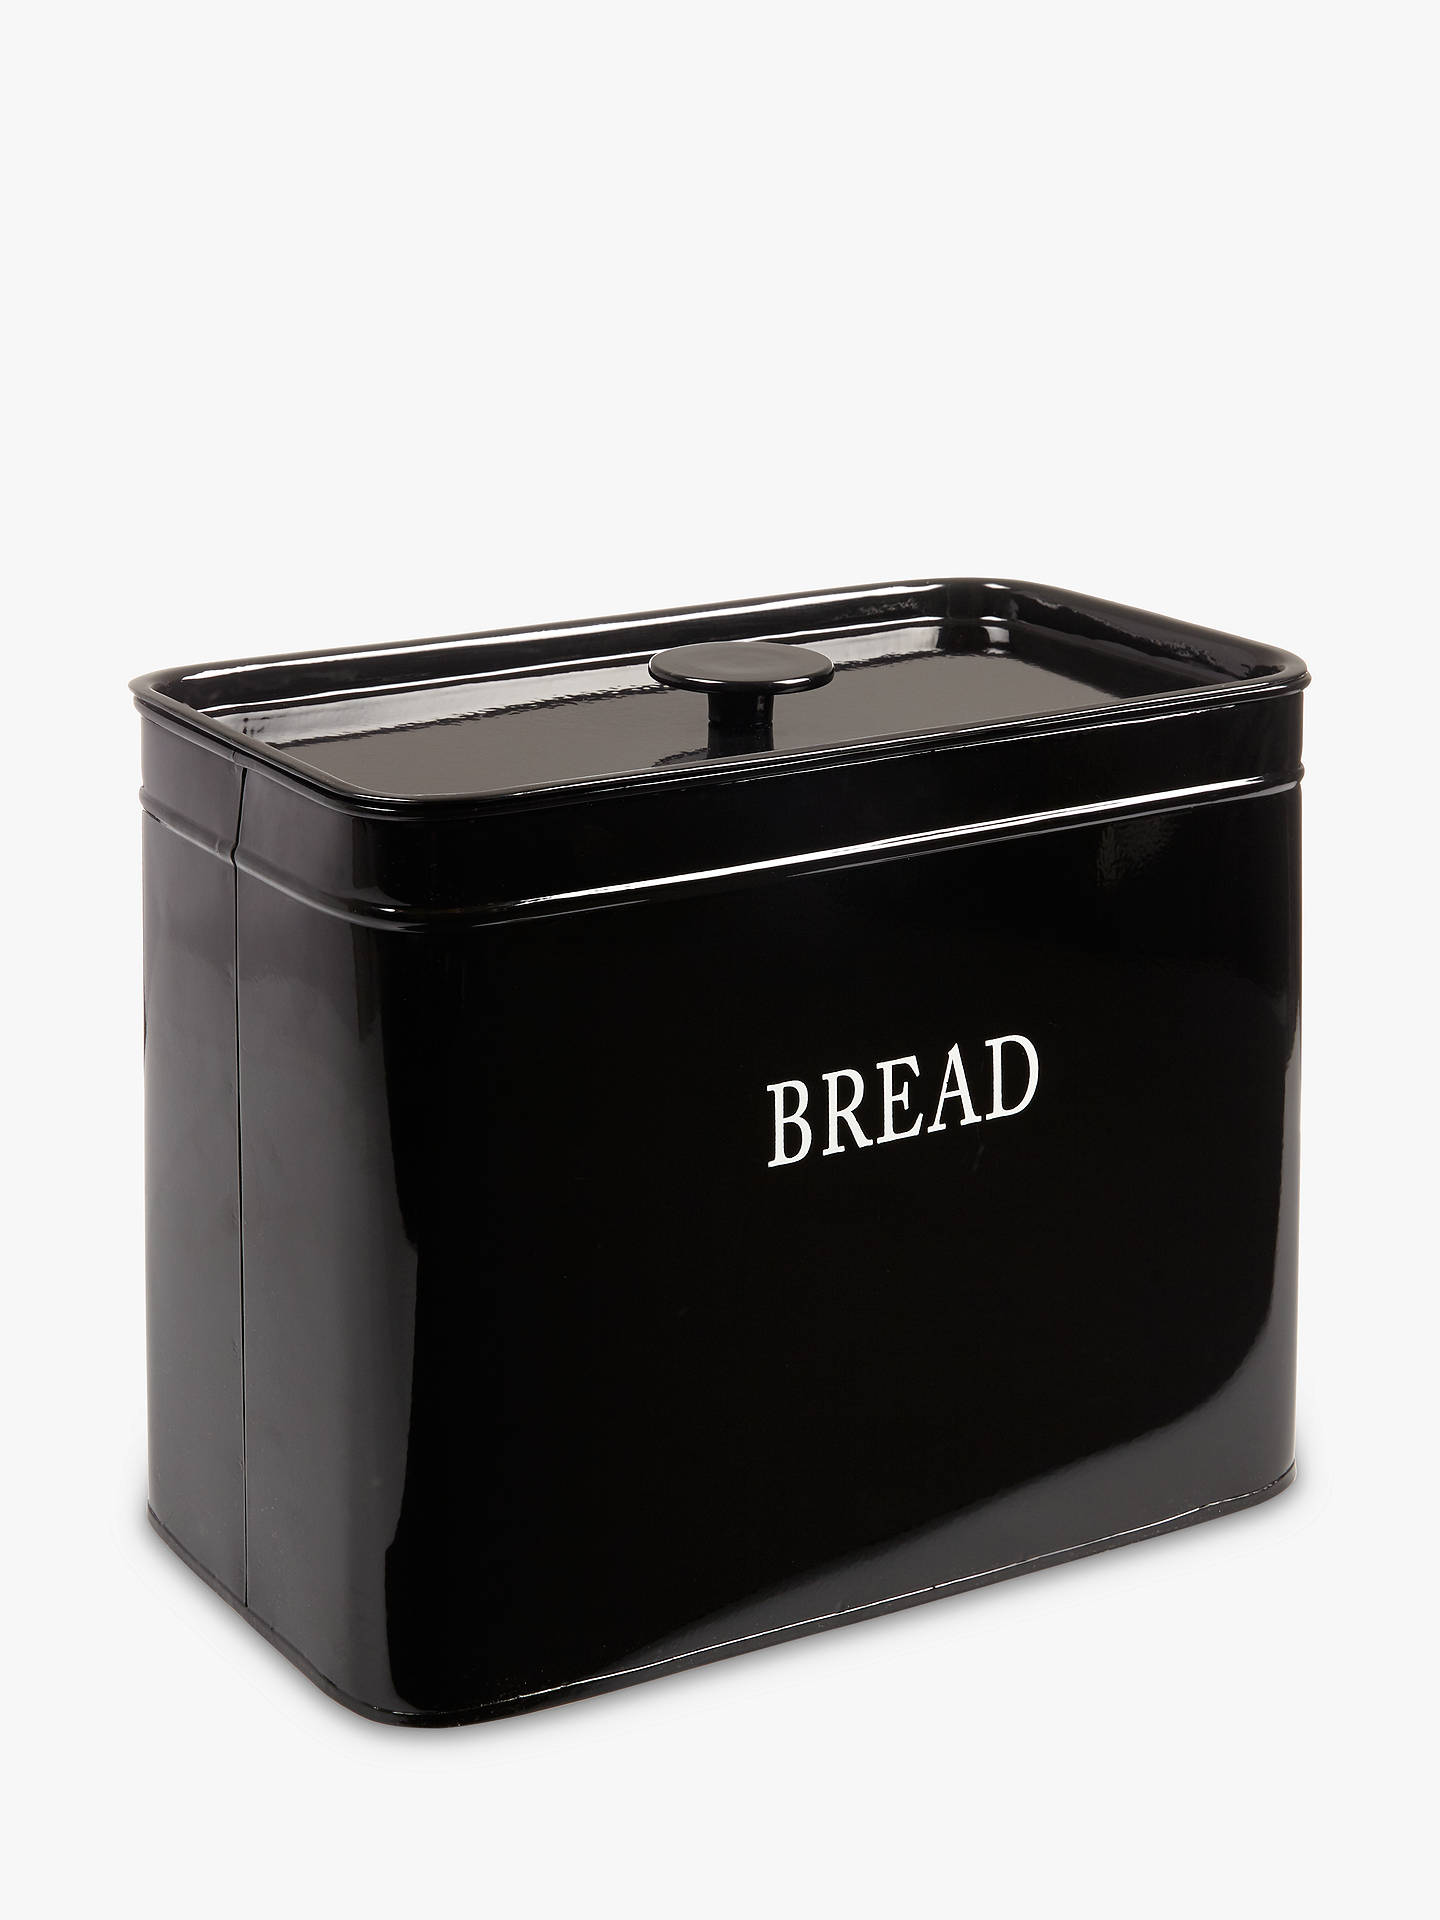 john lewis classic enamel bread bin black at john lewis. Black Bedroom Furniture Sets. Home Design Ideas